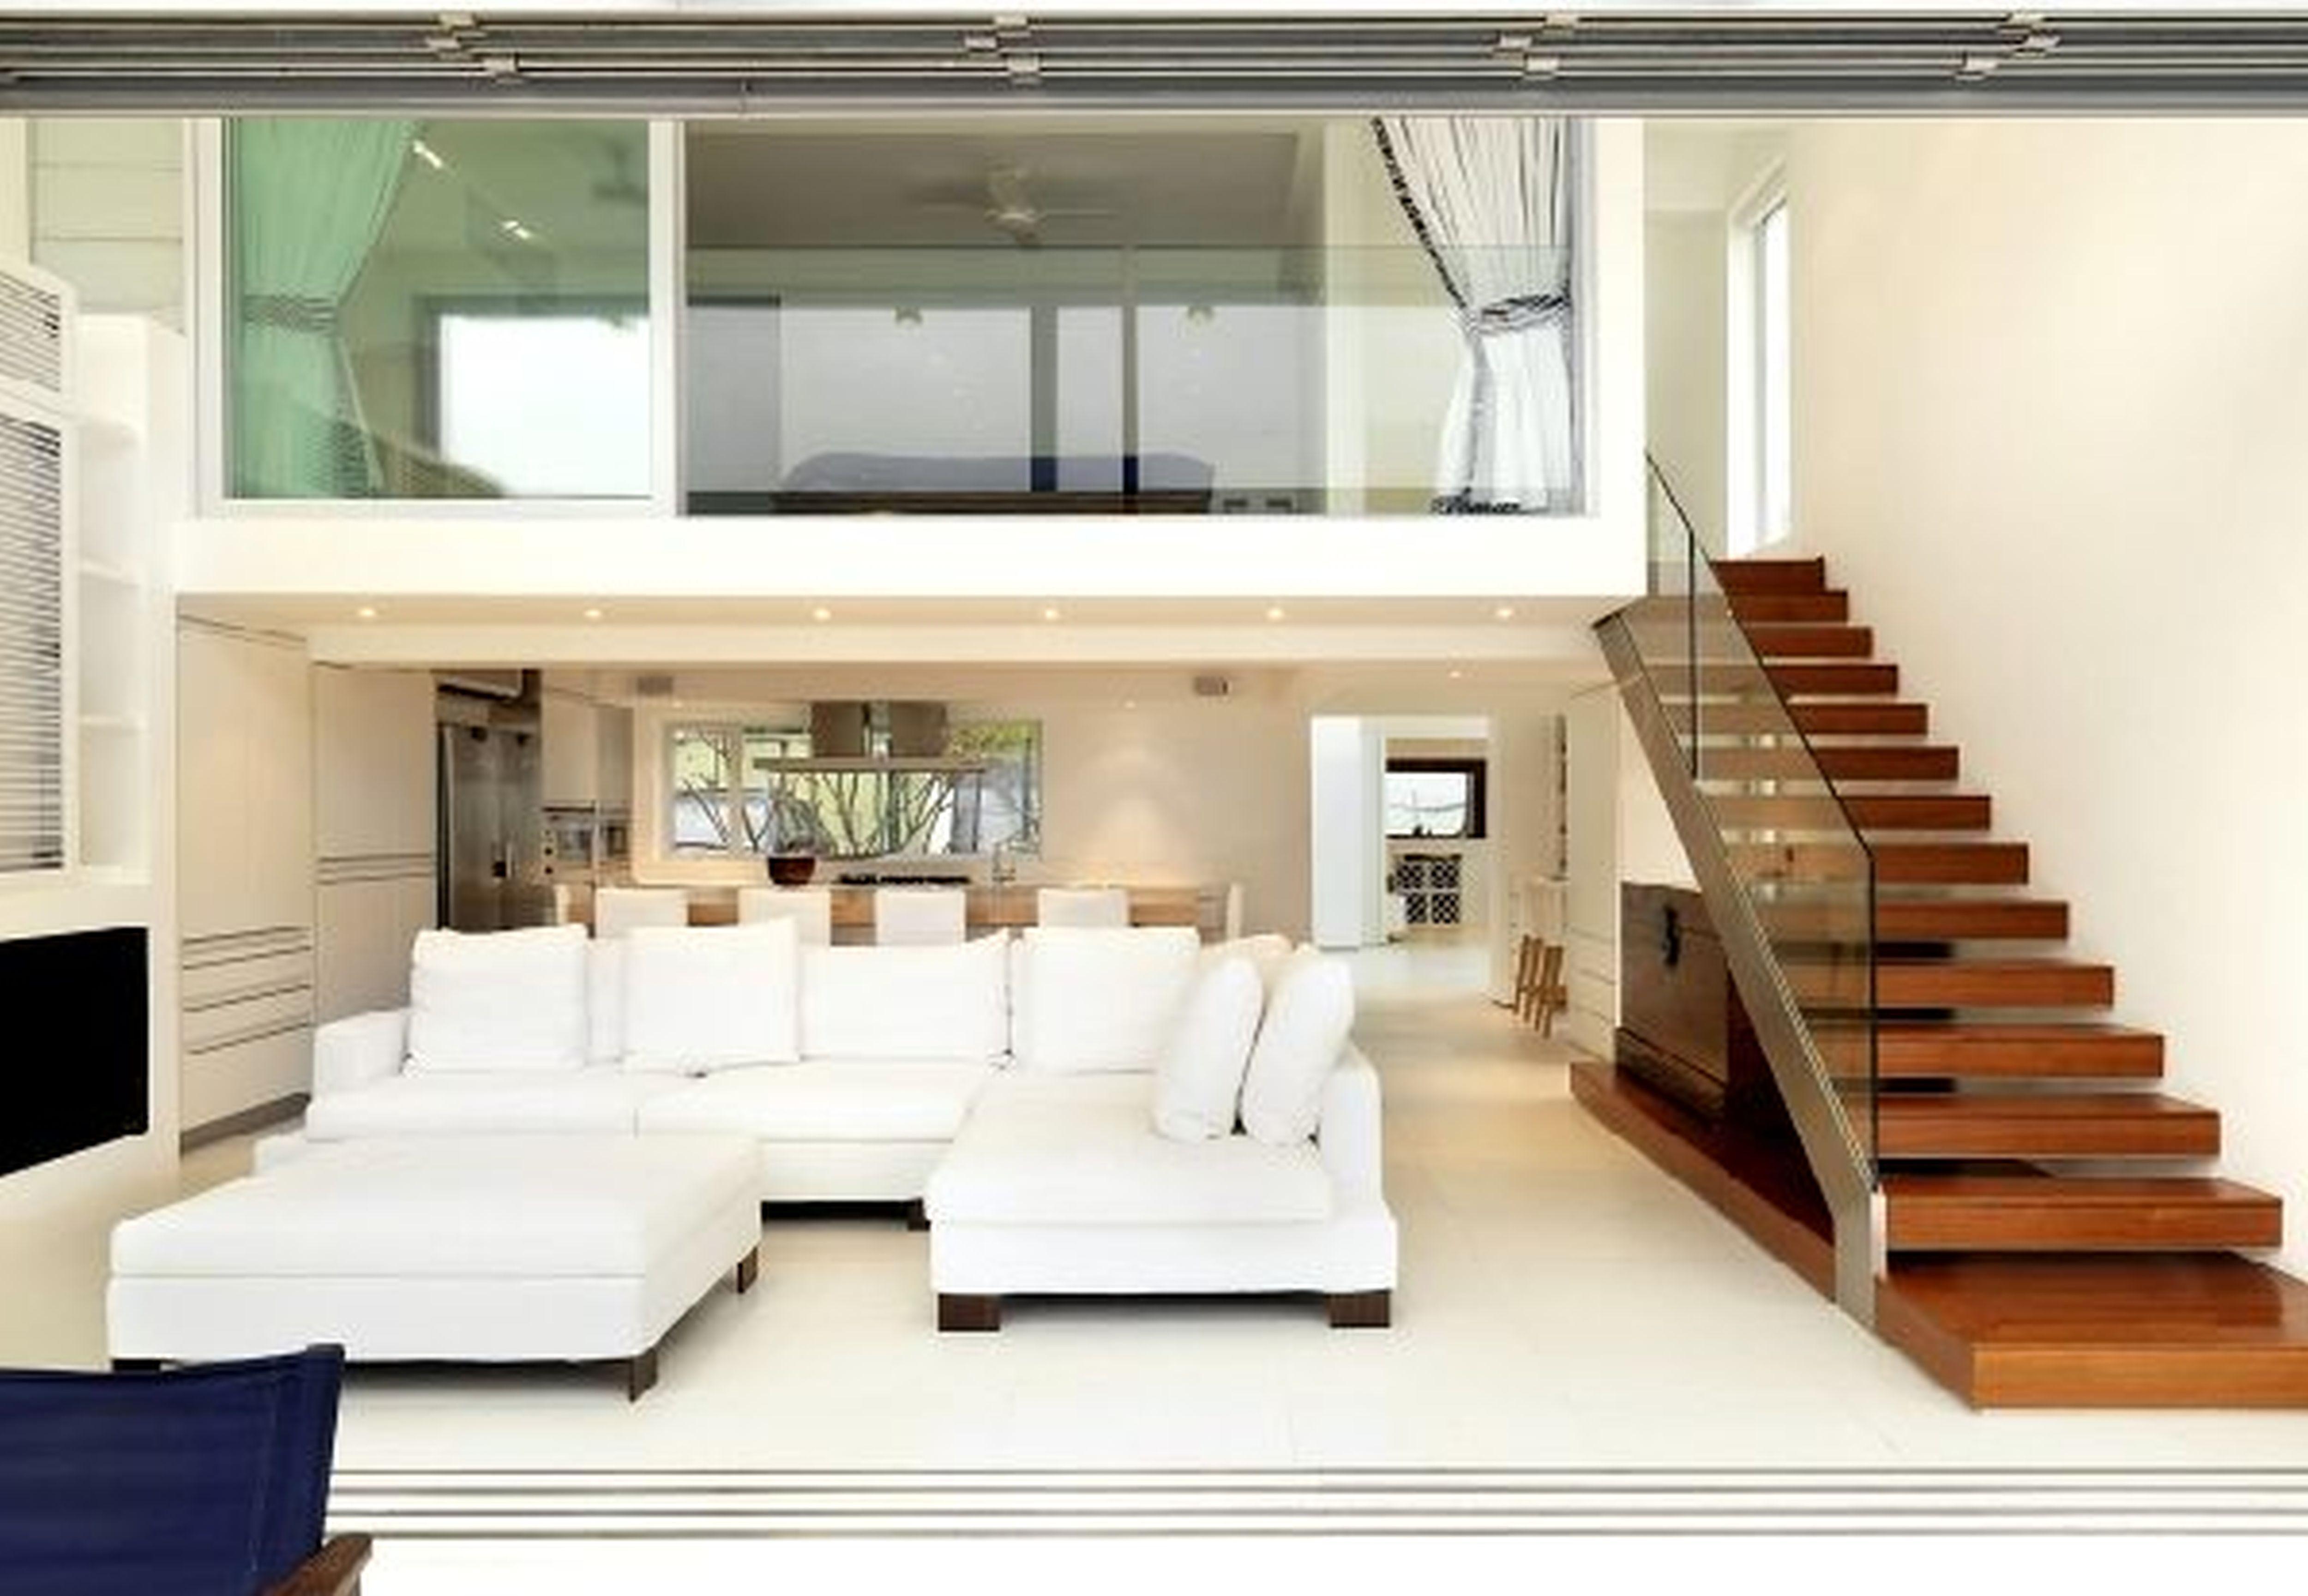 House interior design modern eclectic dining room designs MRTPOVB